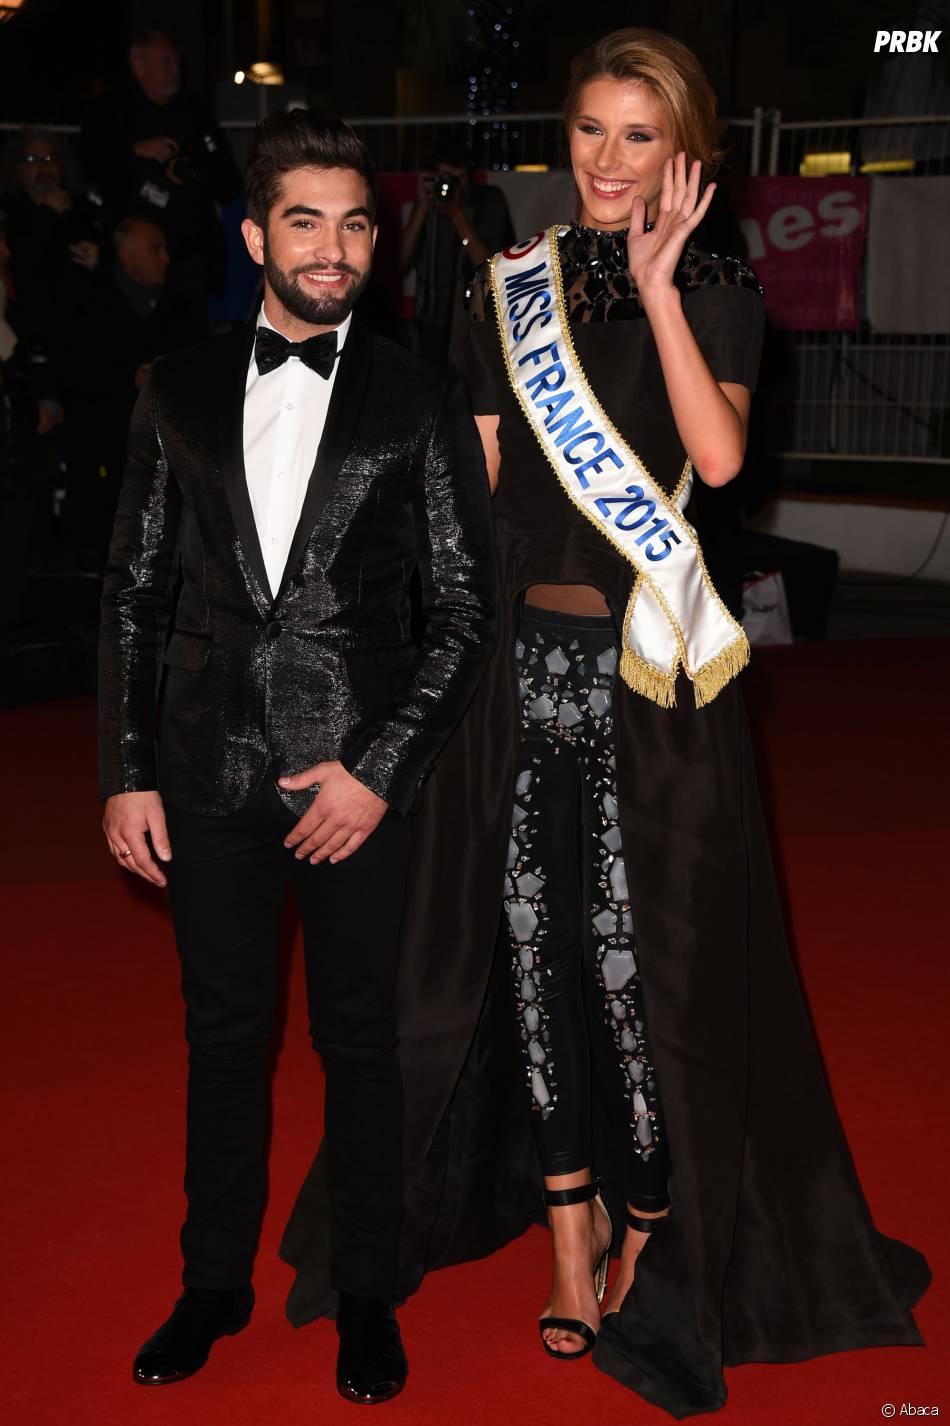 Camille Cerf et Kendi aux NRJ Music Awards 2015